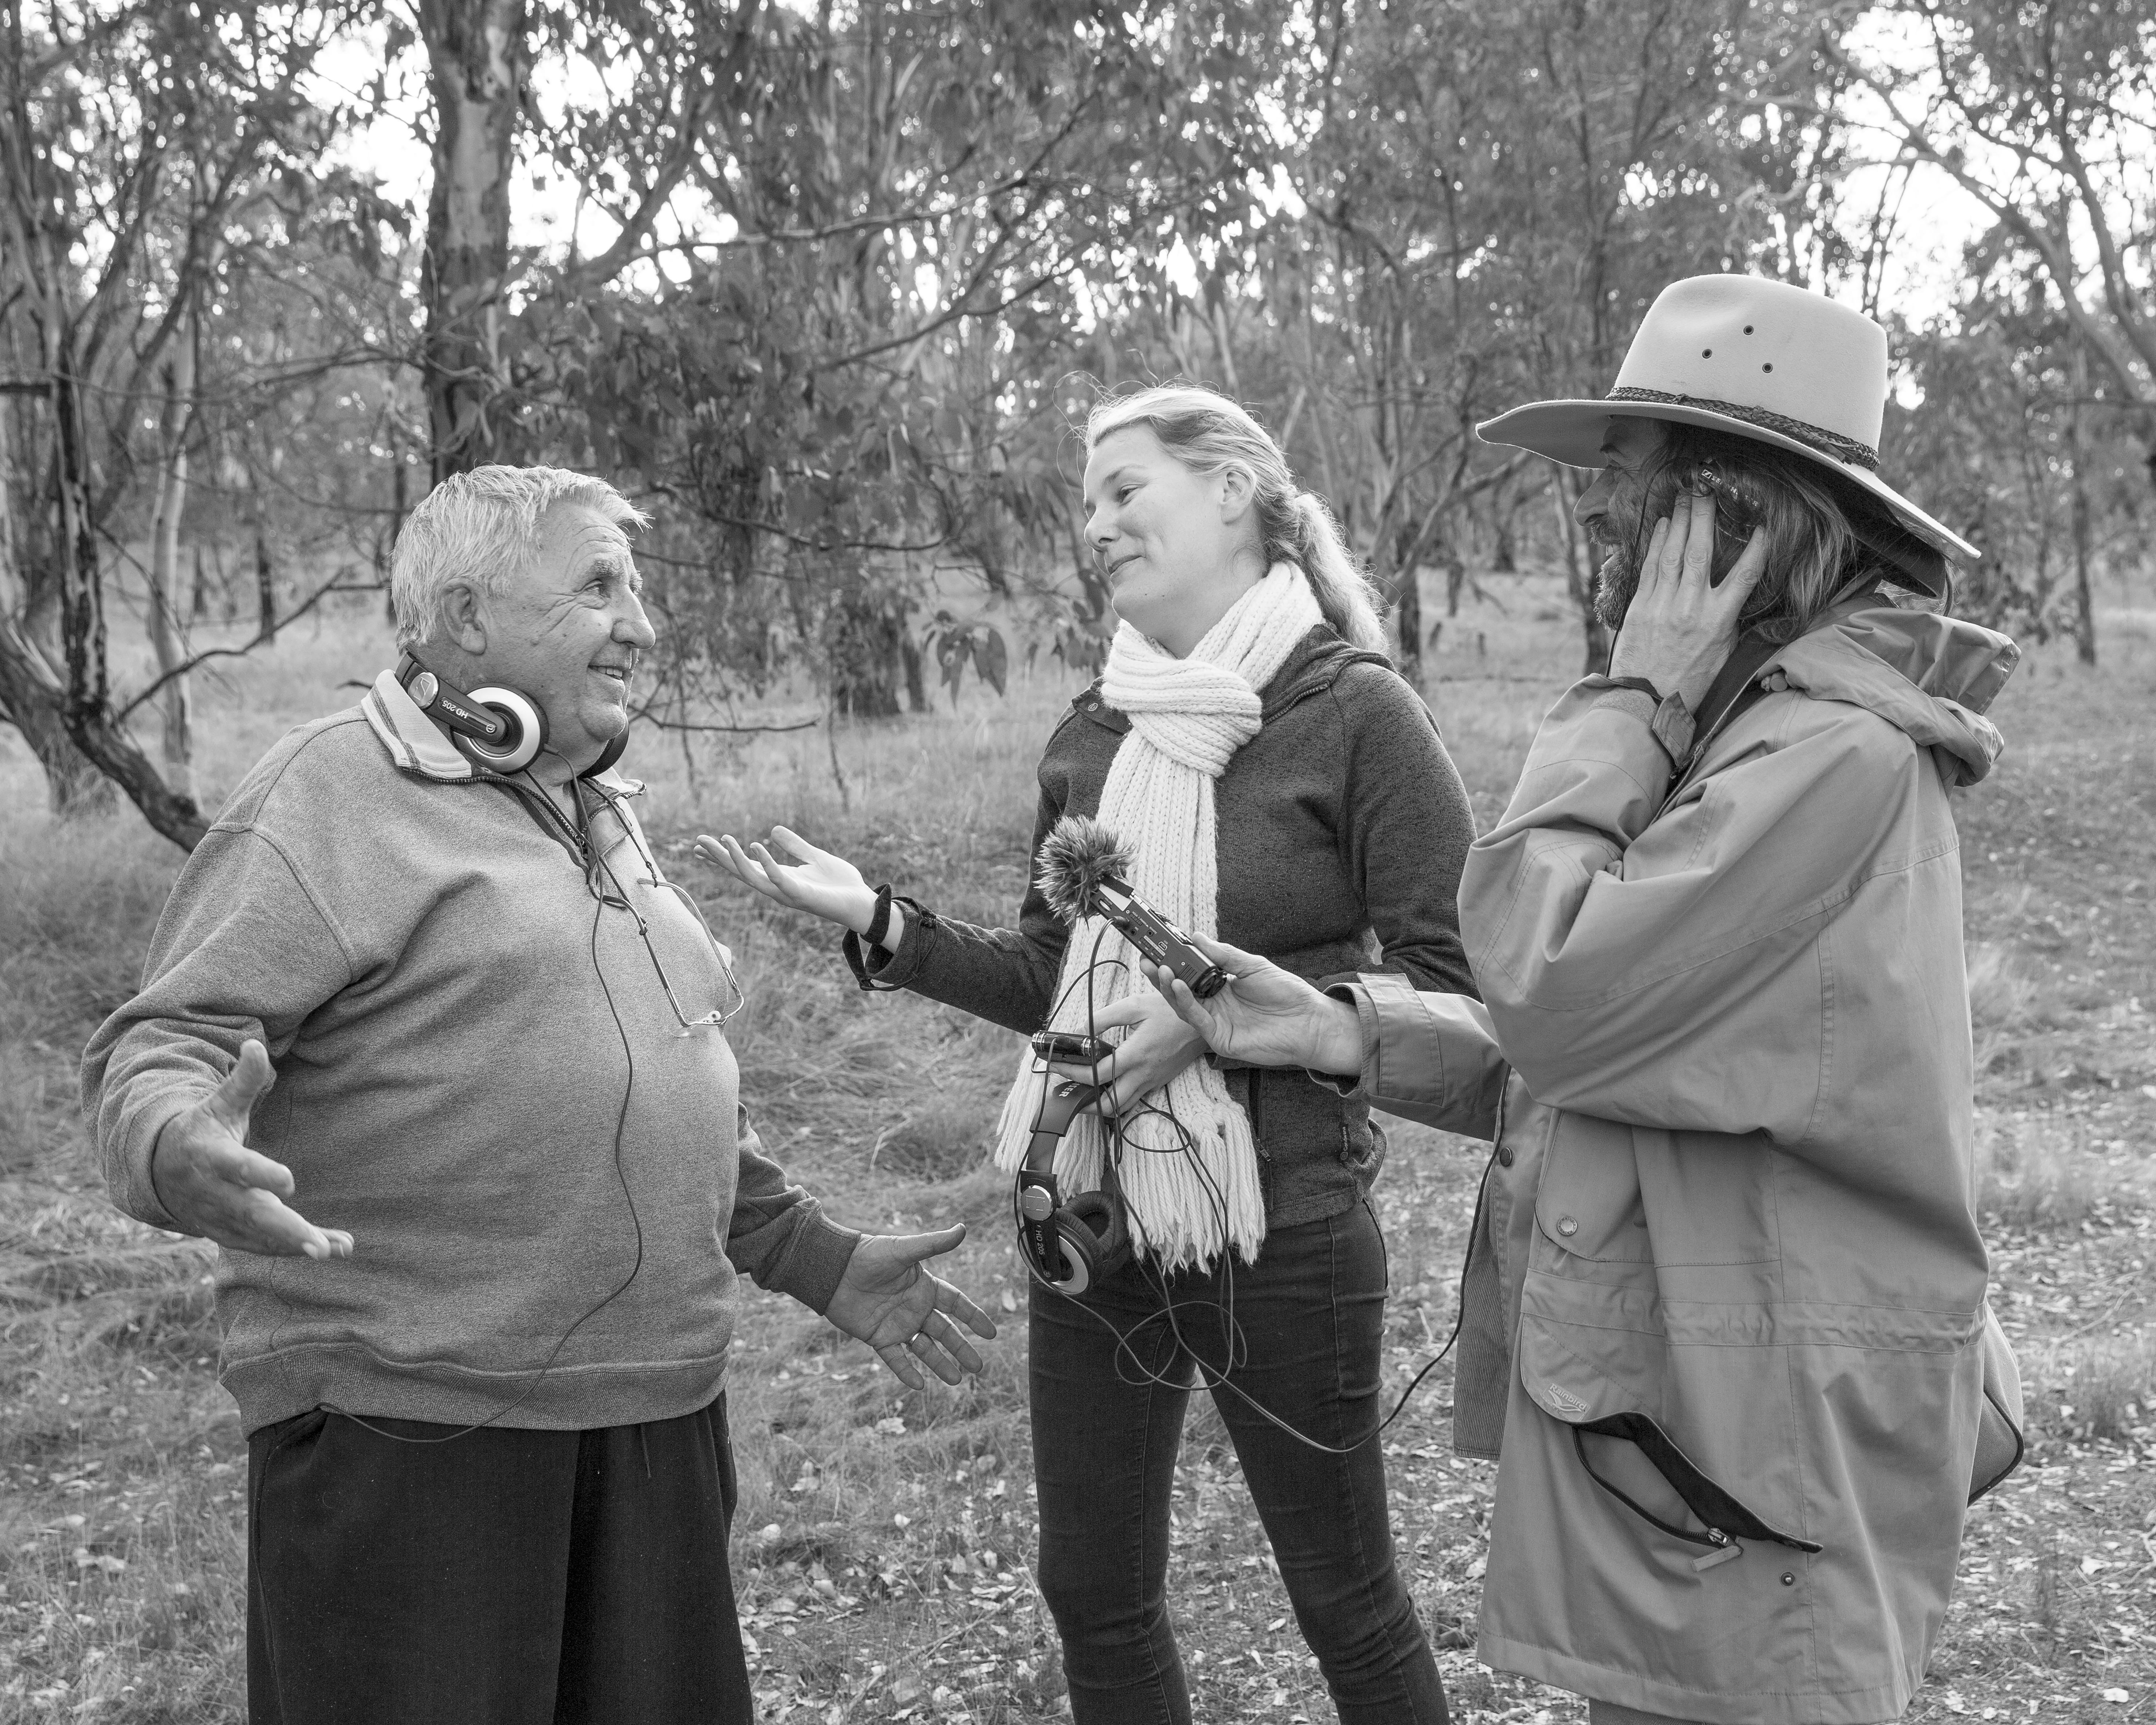 The Wired Lab interview Wiradjuri elder Bob Glanville on a TSR near Cootamundra. Photo by James Farley.